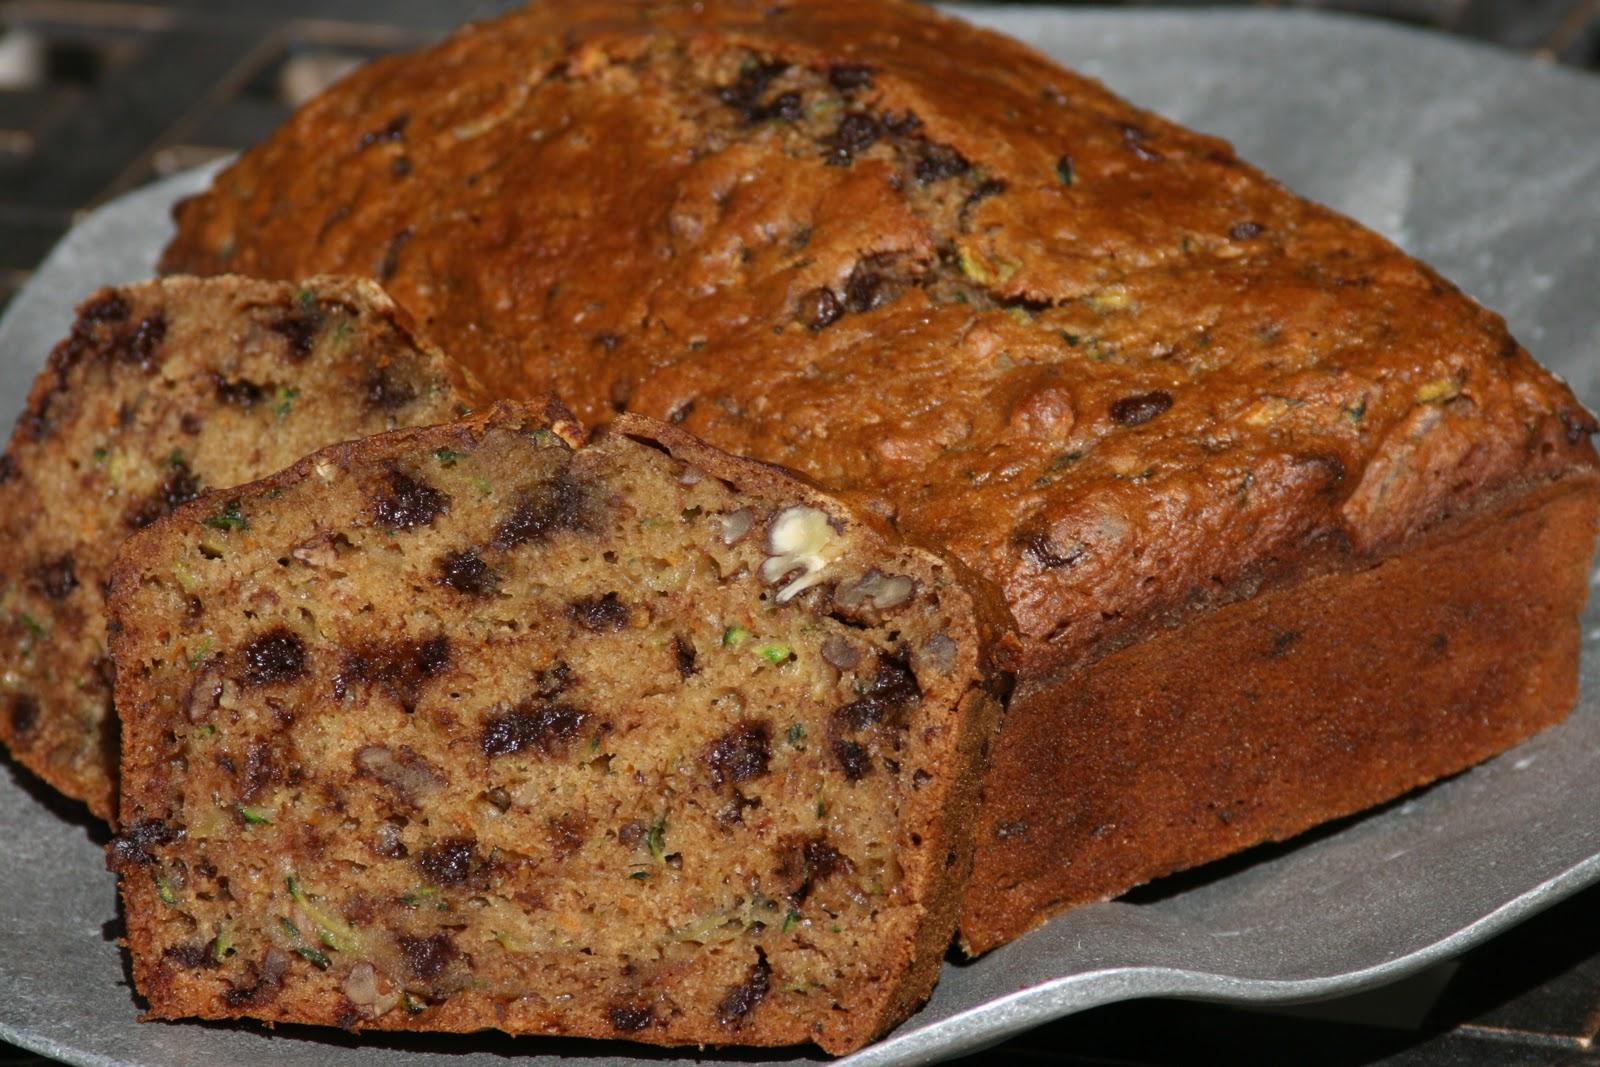 Basic Zucchini Bread or Chocolate Chip Zucchini Bread